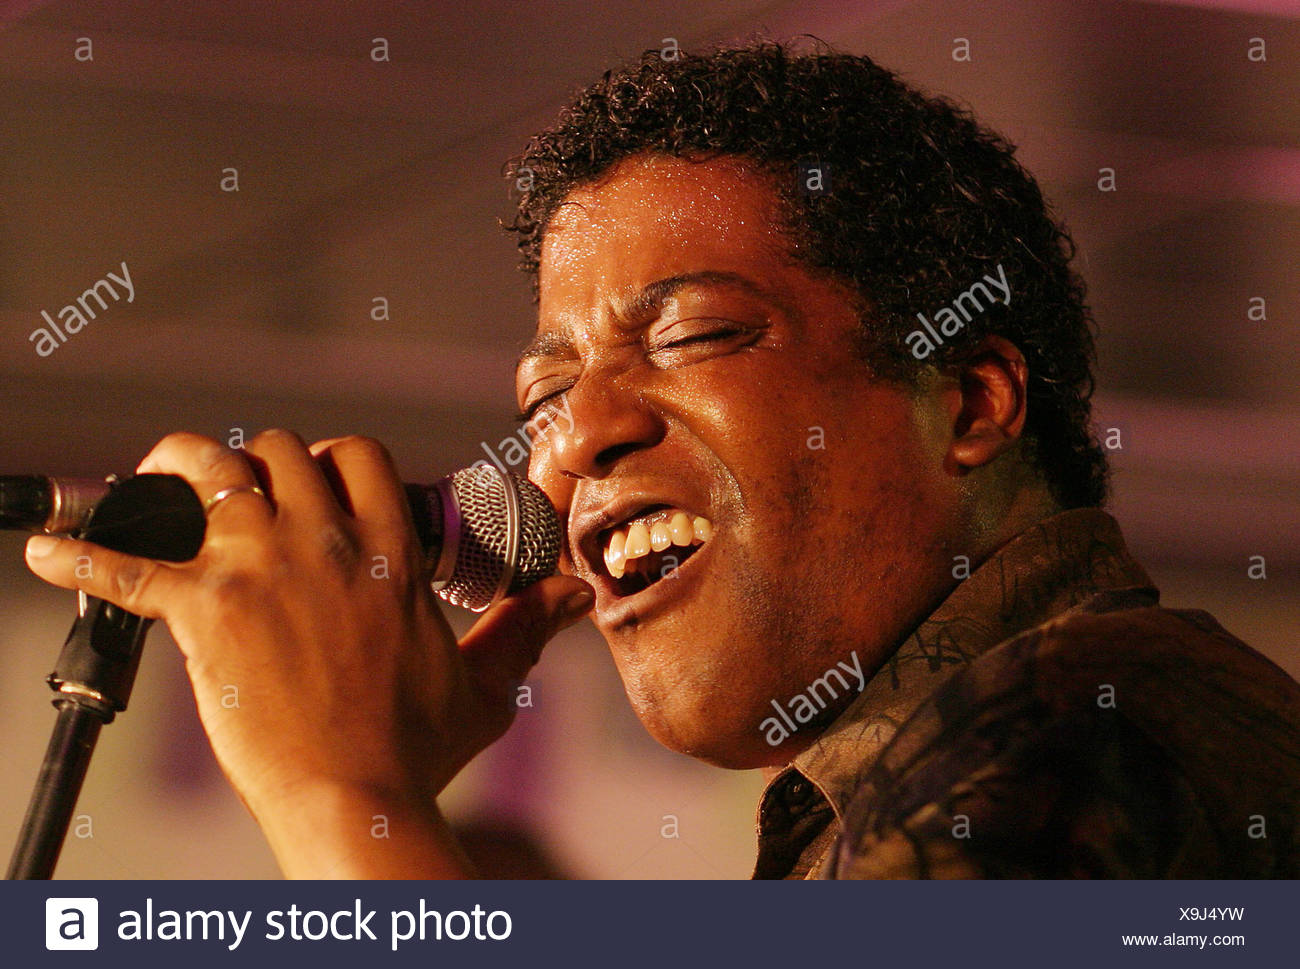 Soul-Singer Sydney Youngblood Stock Photo: 281296845 - Alamy